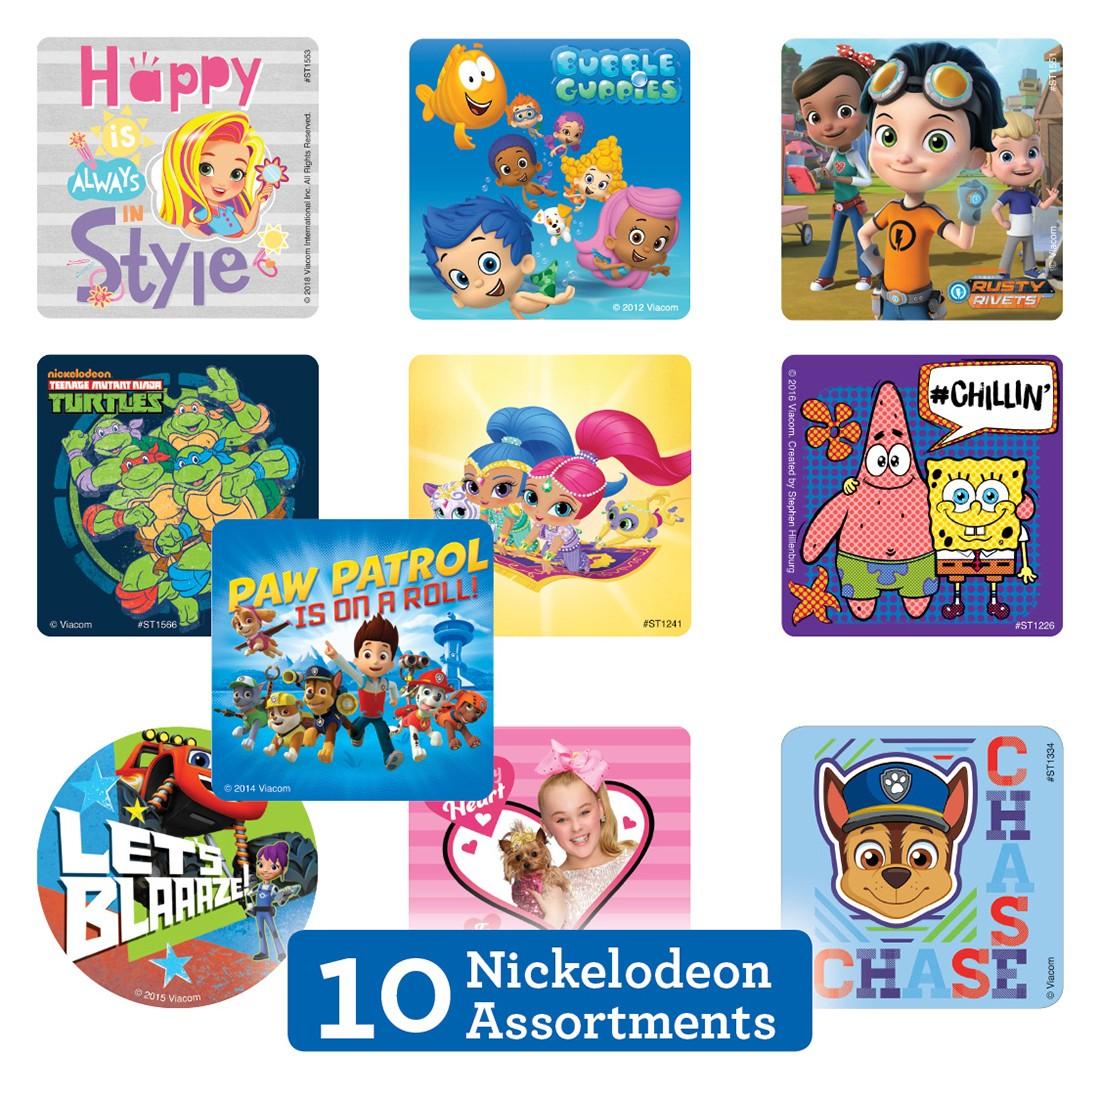 Nickelodeon Sticker Sampler [image]